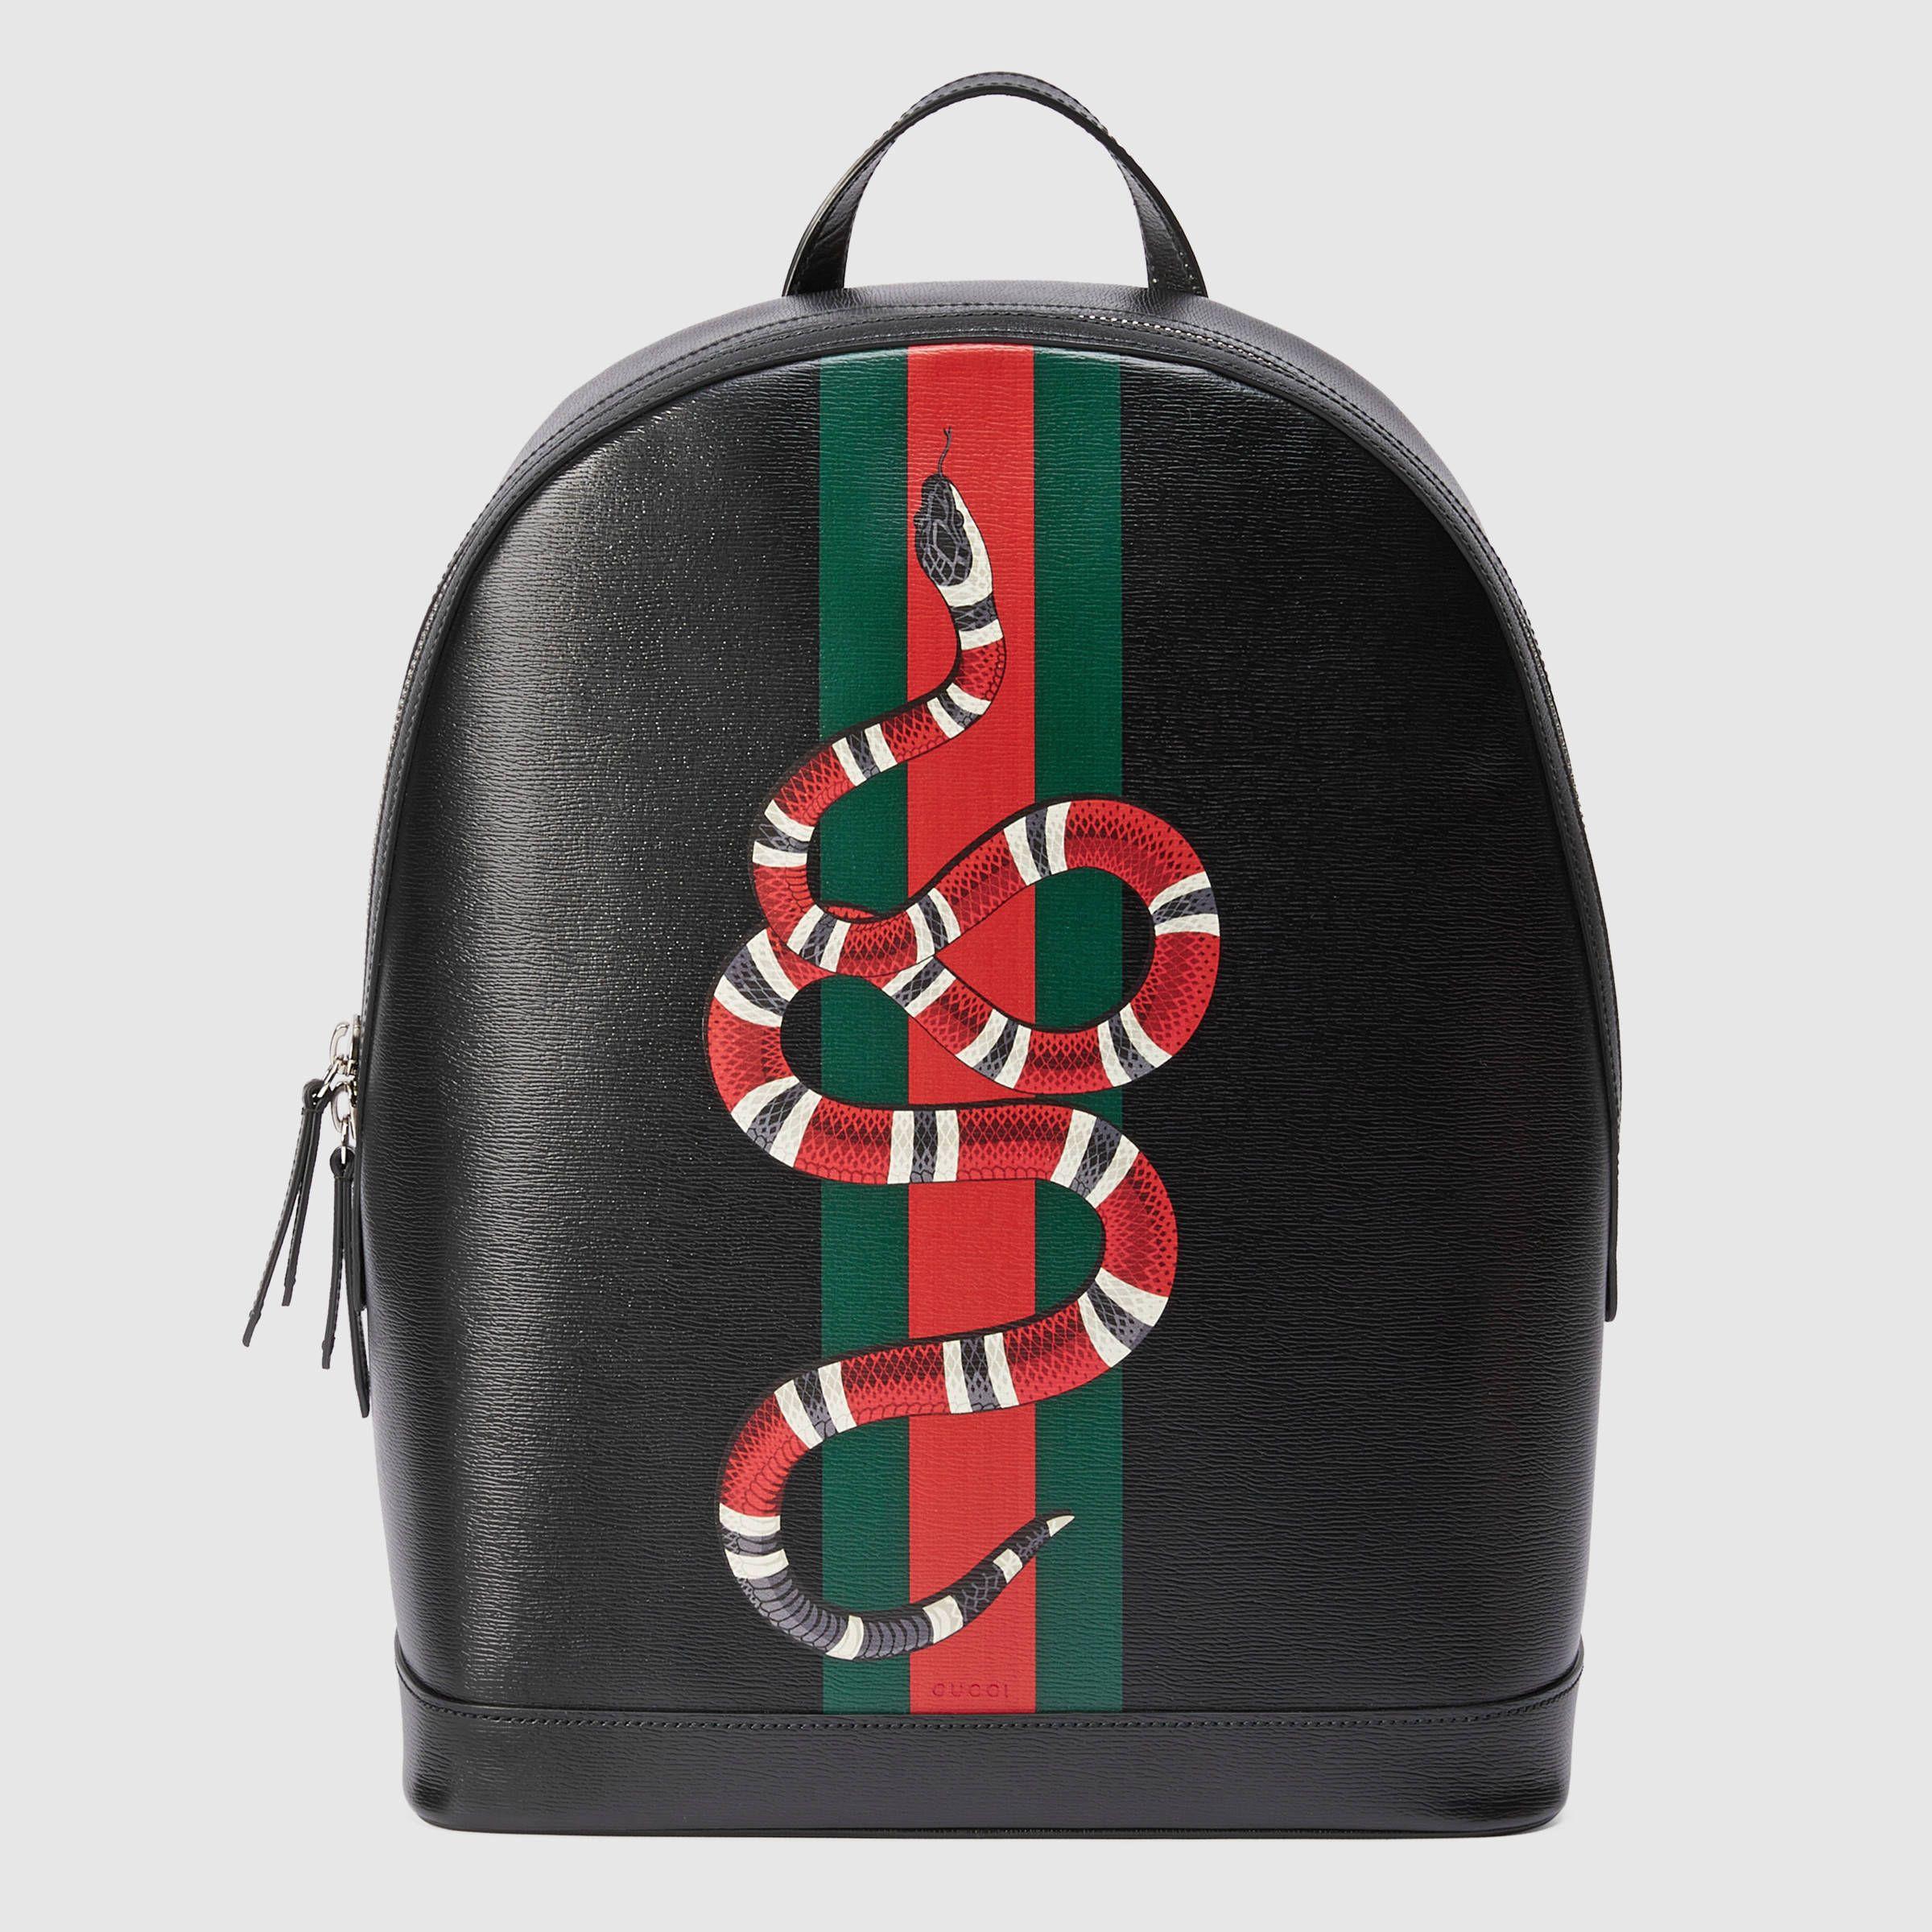 web and snake print leather backpack bagdad manbags